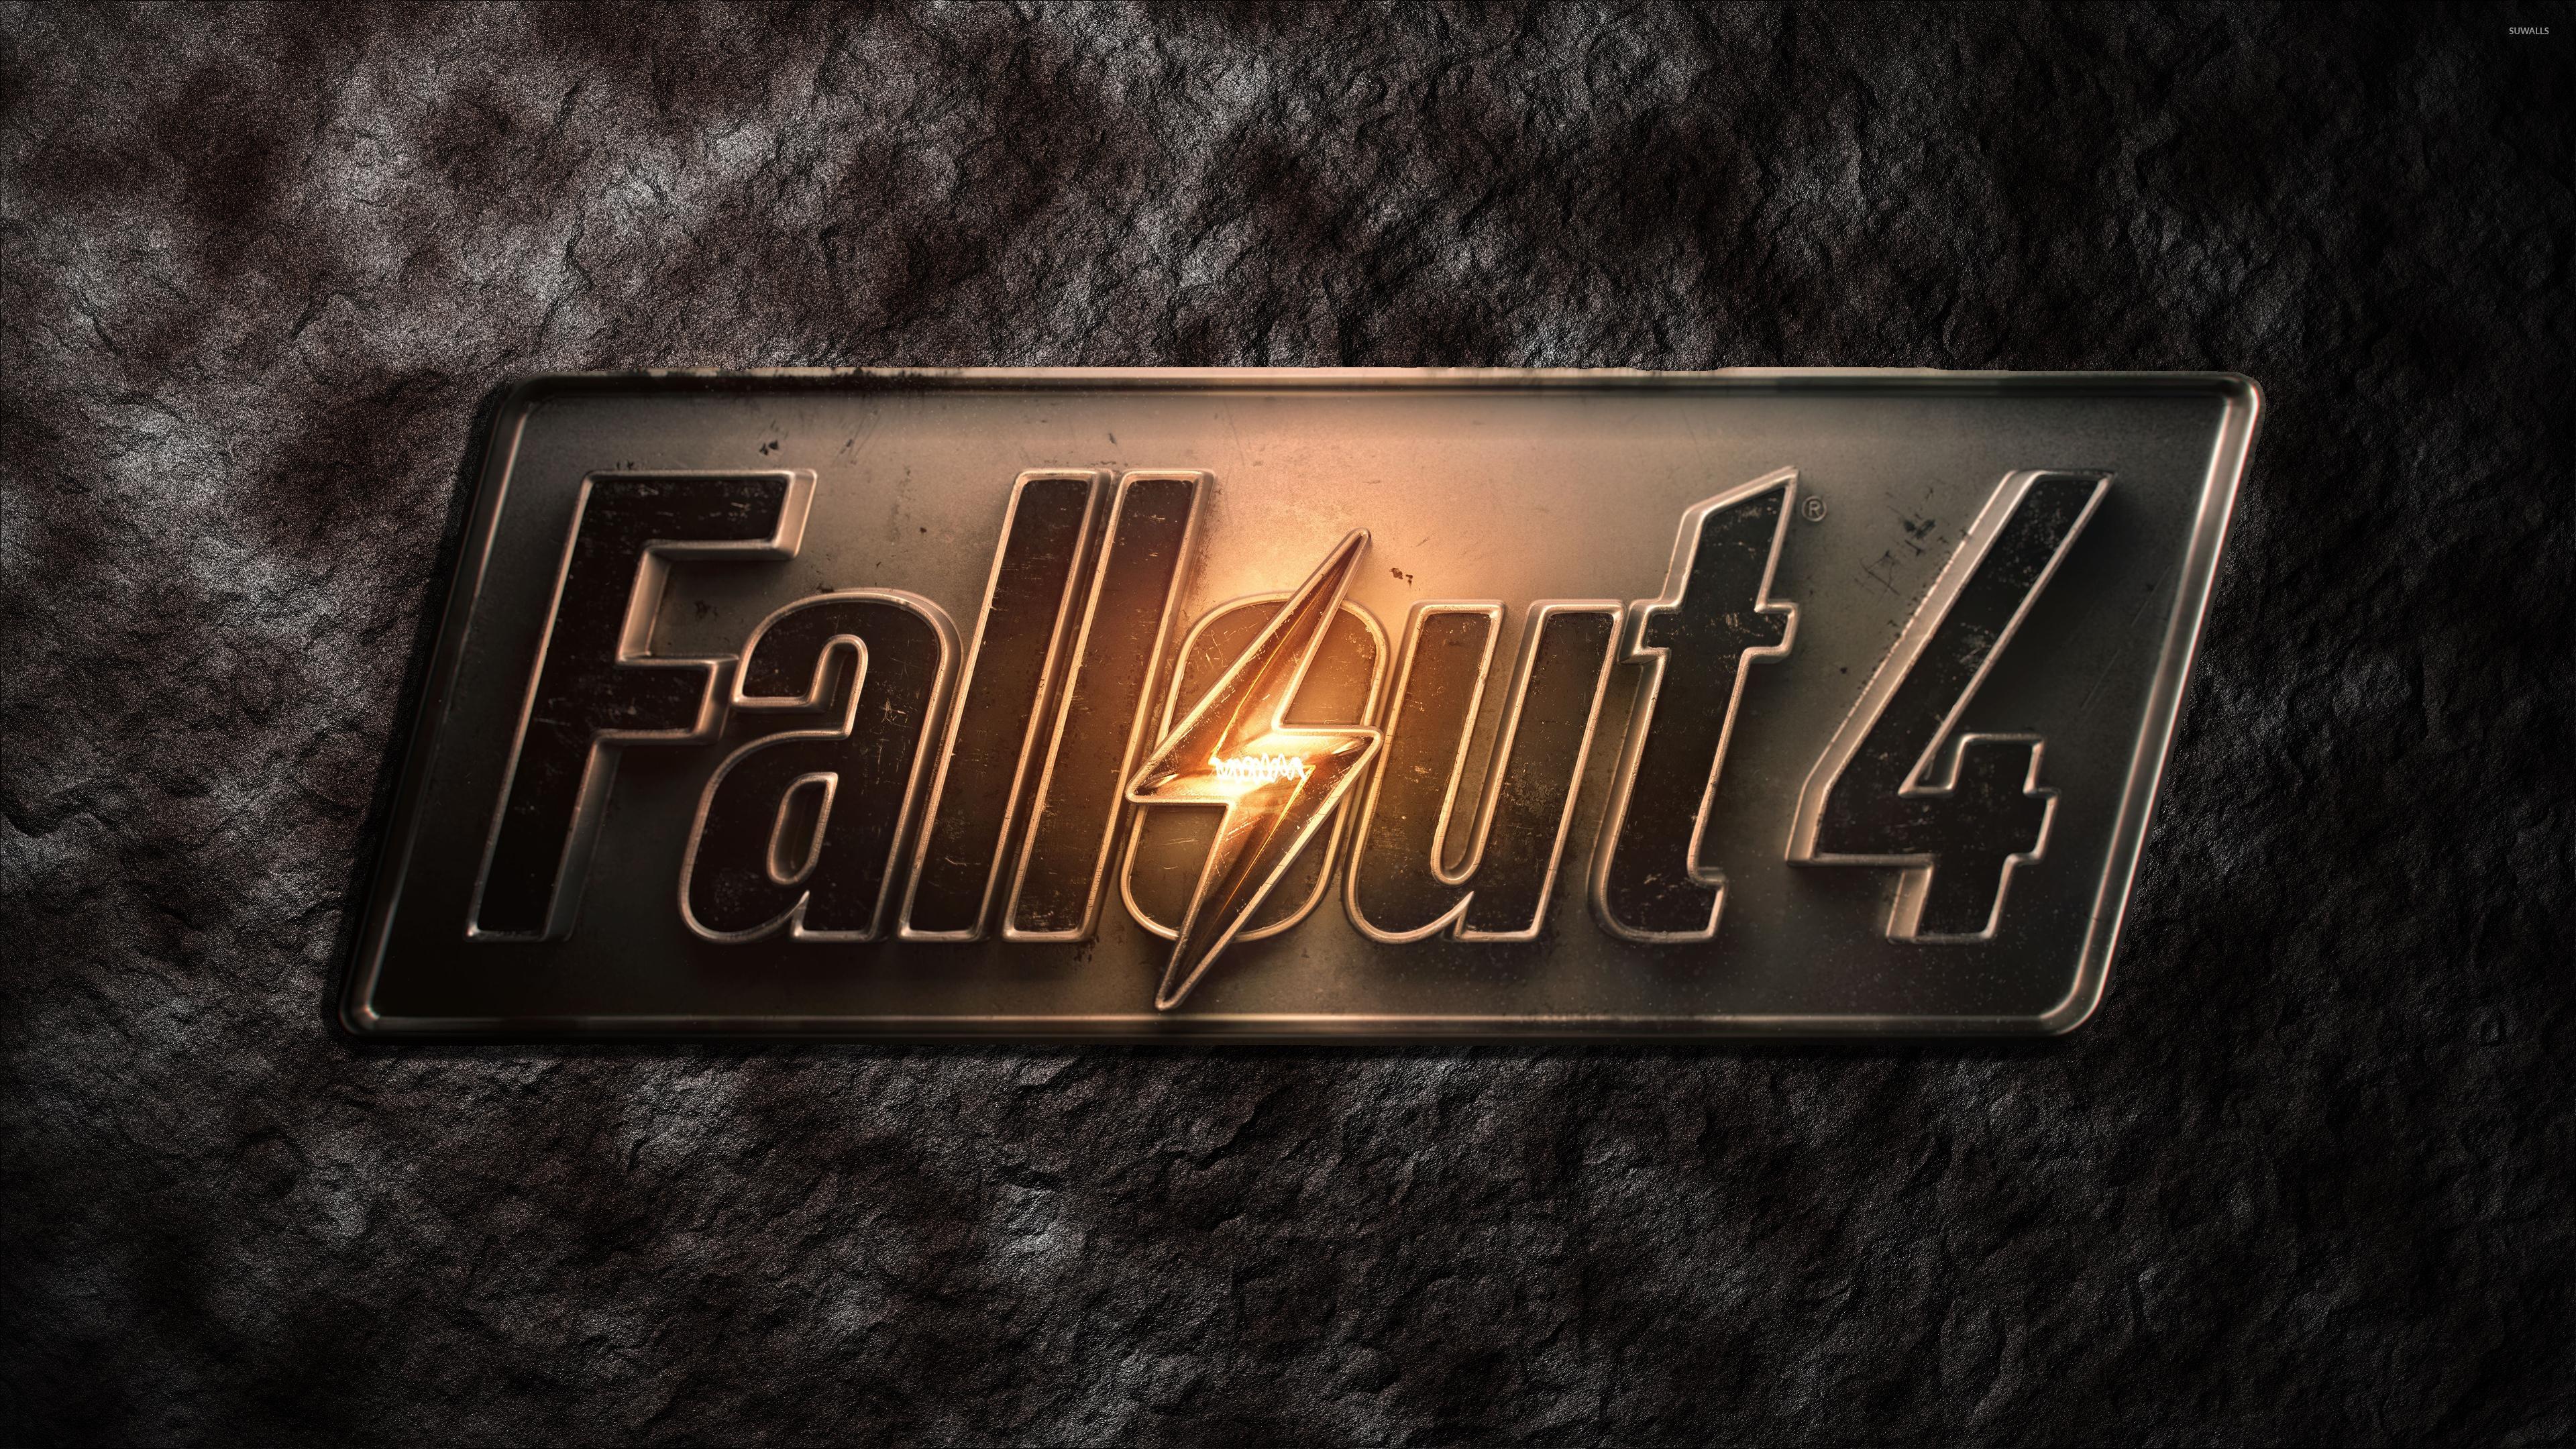 Cool Wallpaper Logo Fallout 4 - metallic-fallout-4-logo-on-stone-50134-3840x2160  You Should Have_732111.jpg